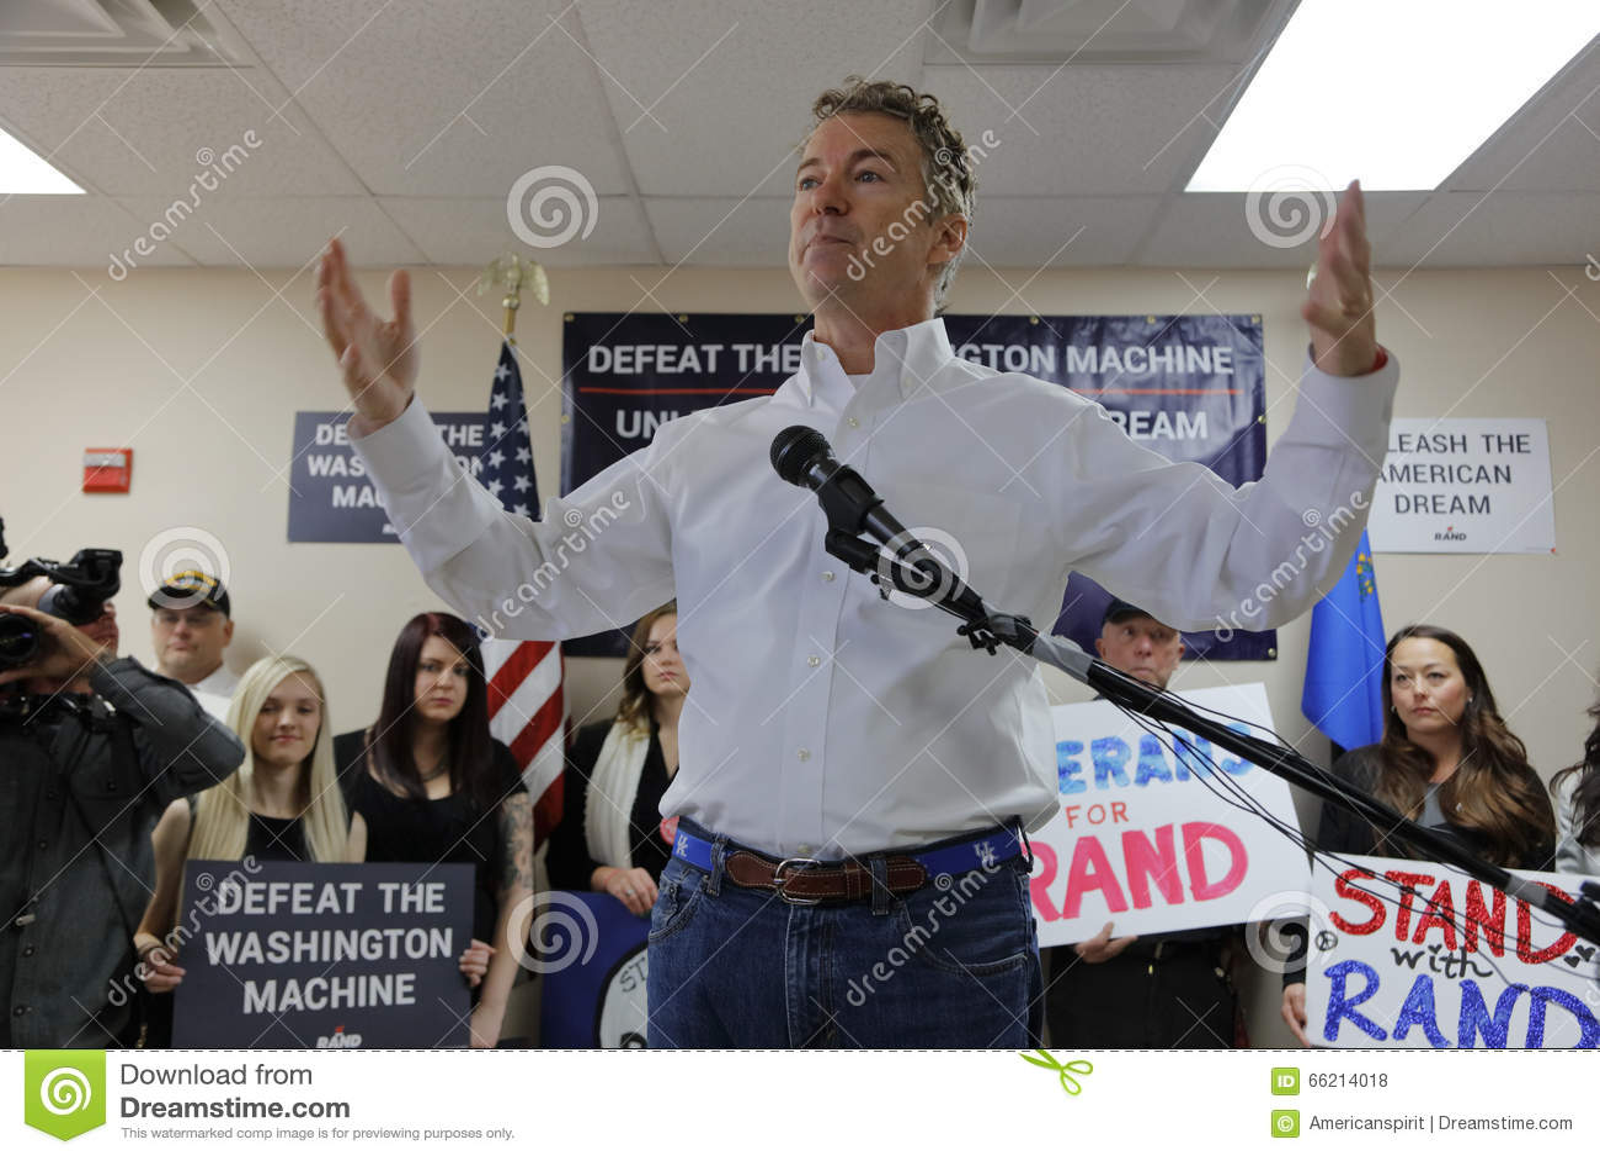 las vegas nv dec 15 201presidential candidate rand paul campaigns